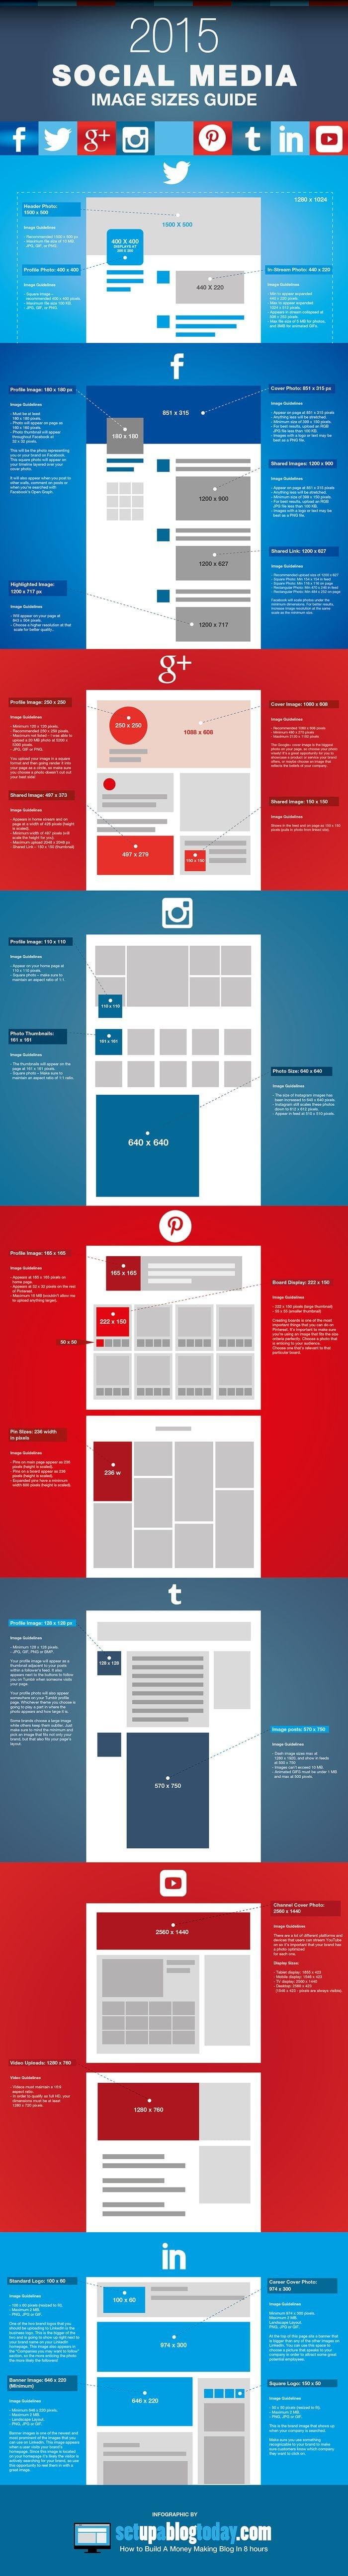 2015-social-media-image-sizes